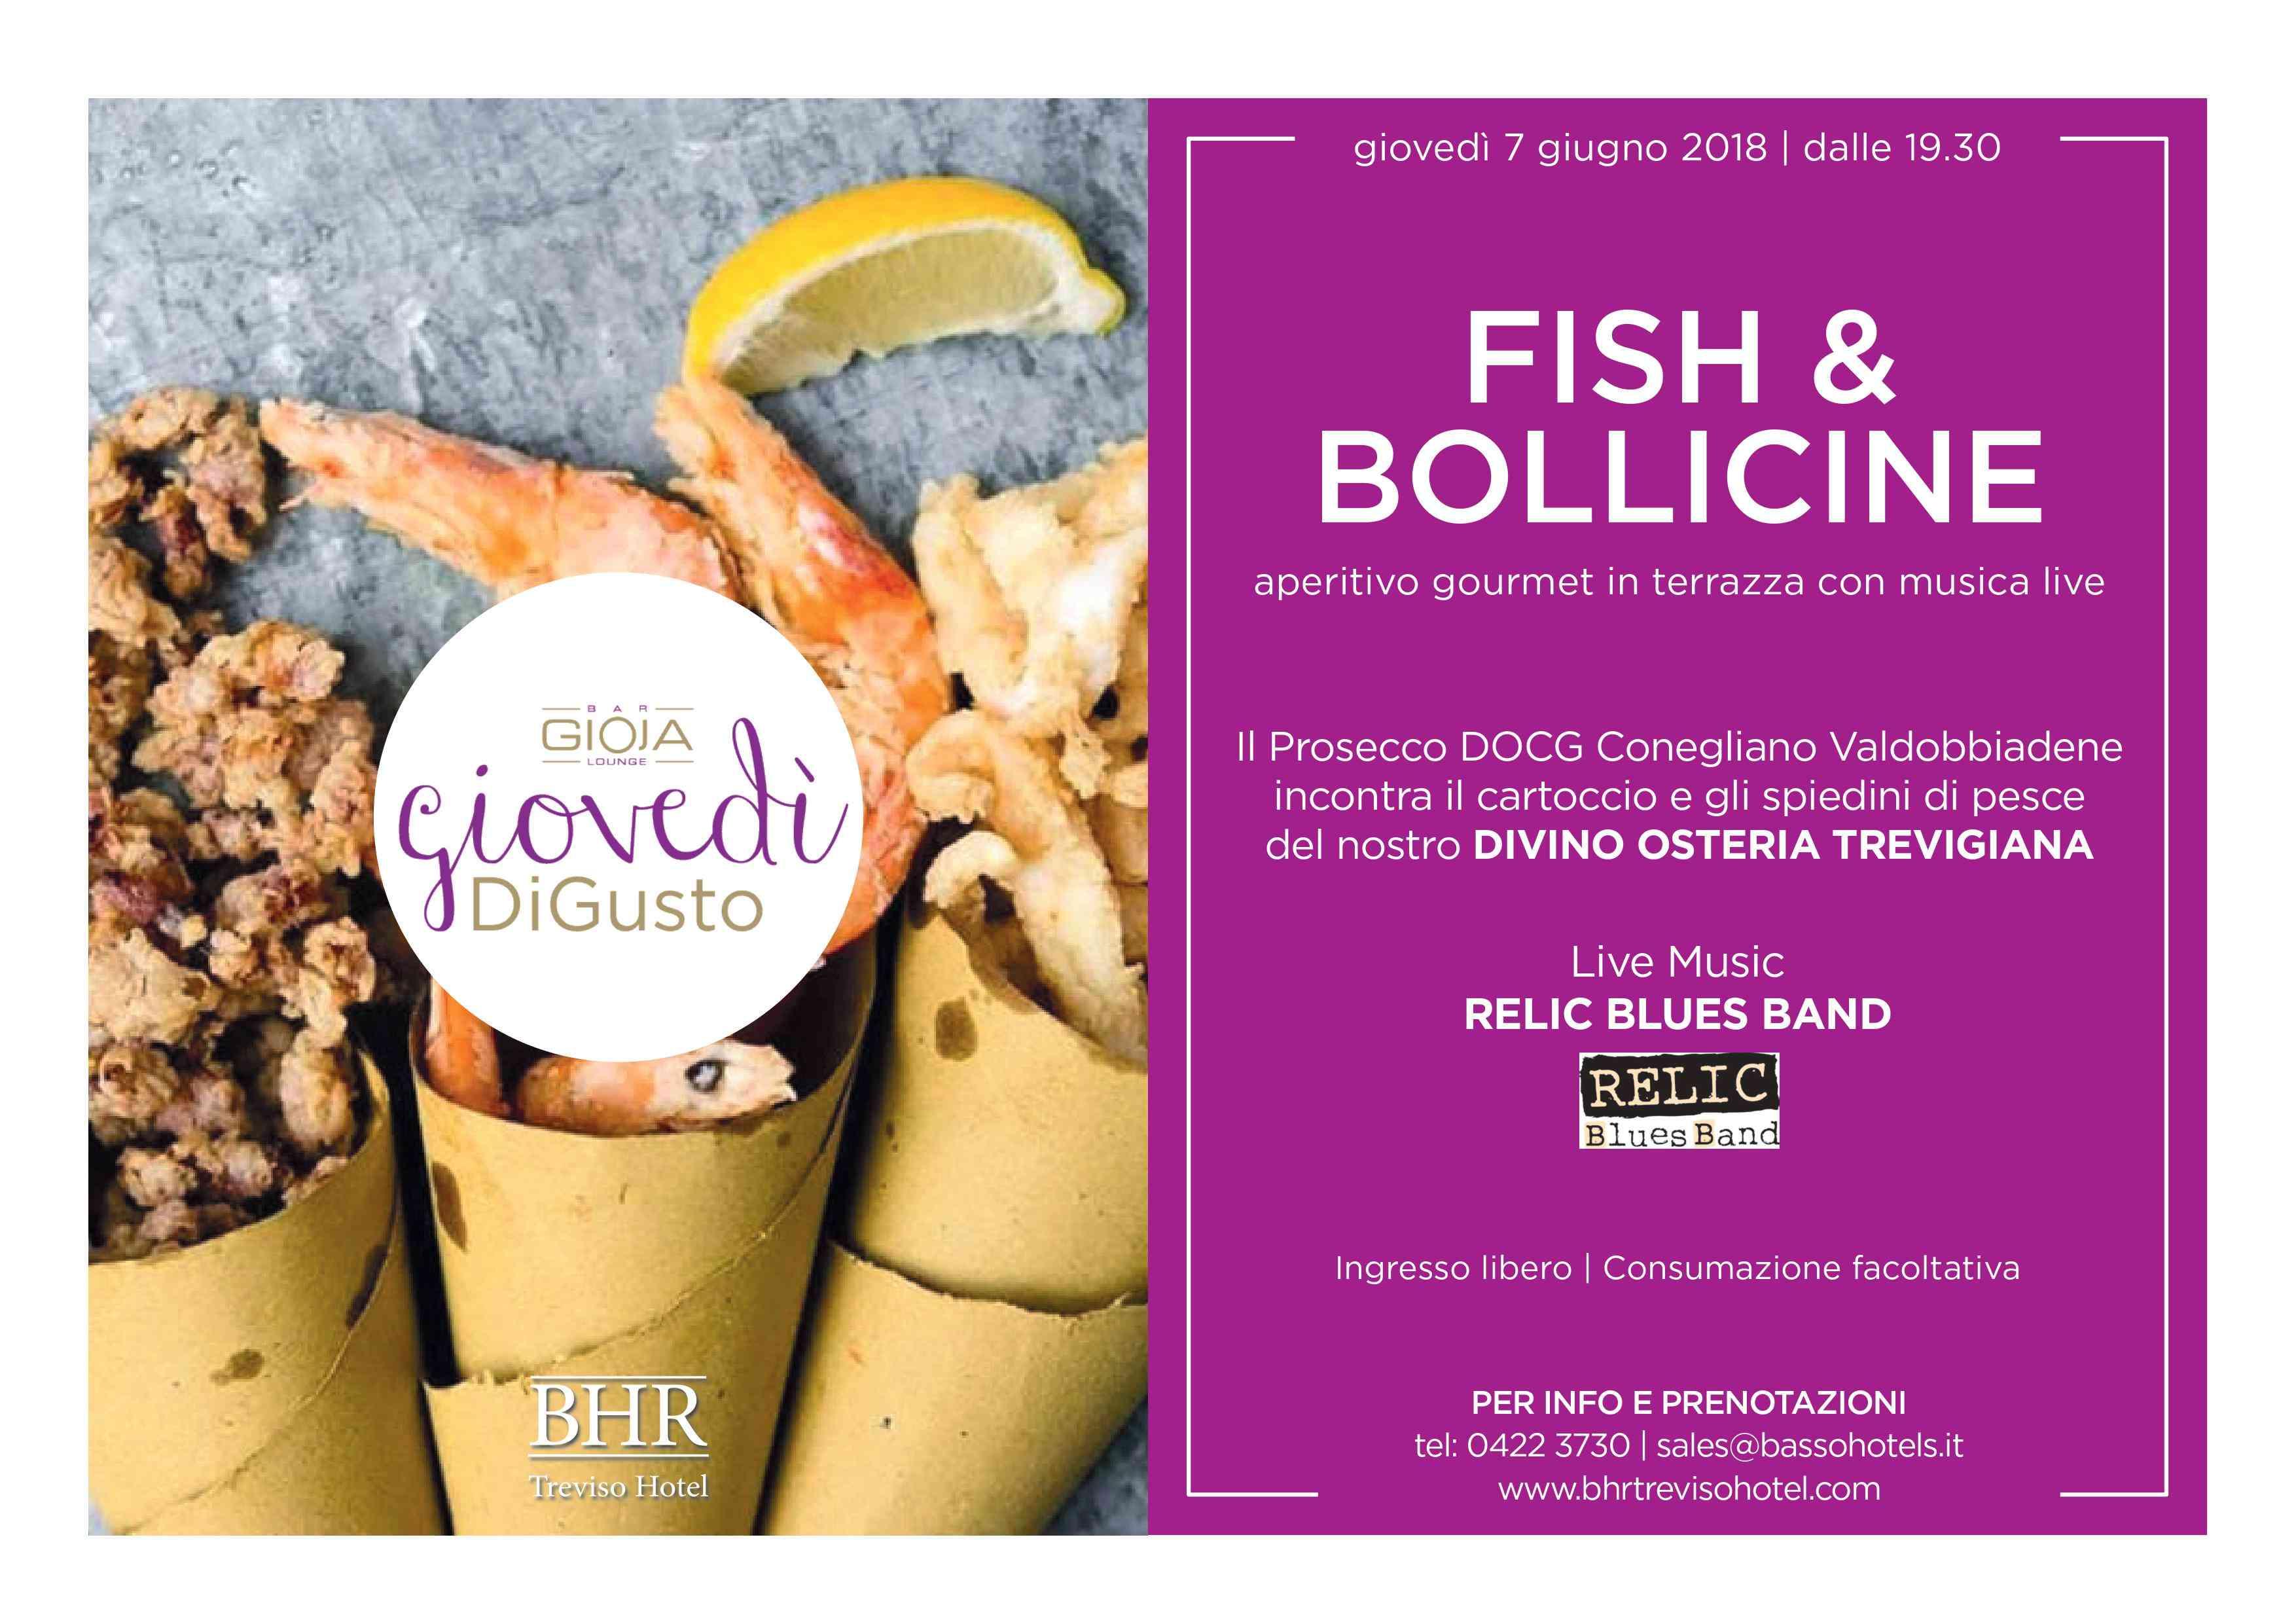 FISH & BOLLICINE al Gioja Lounge Bar